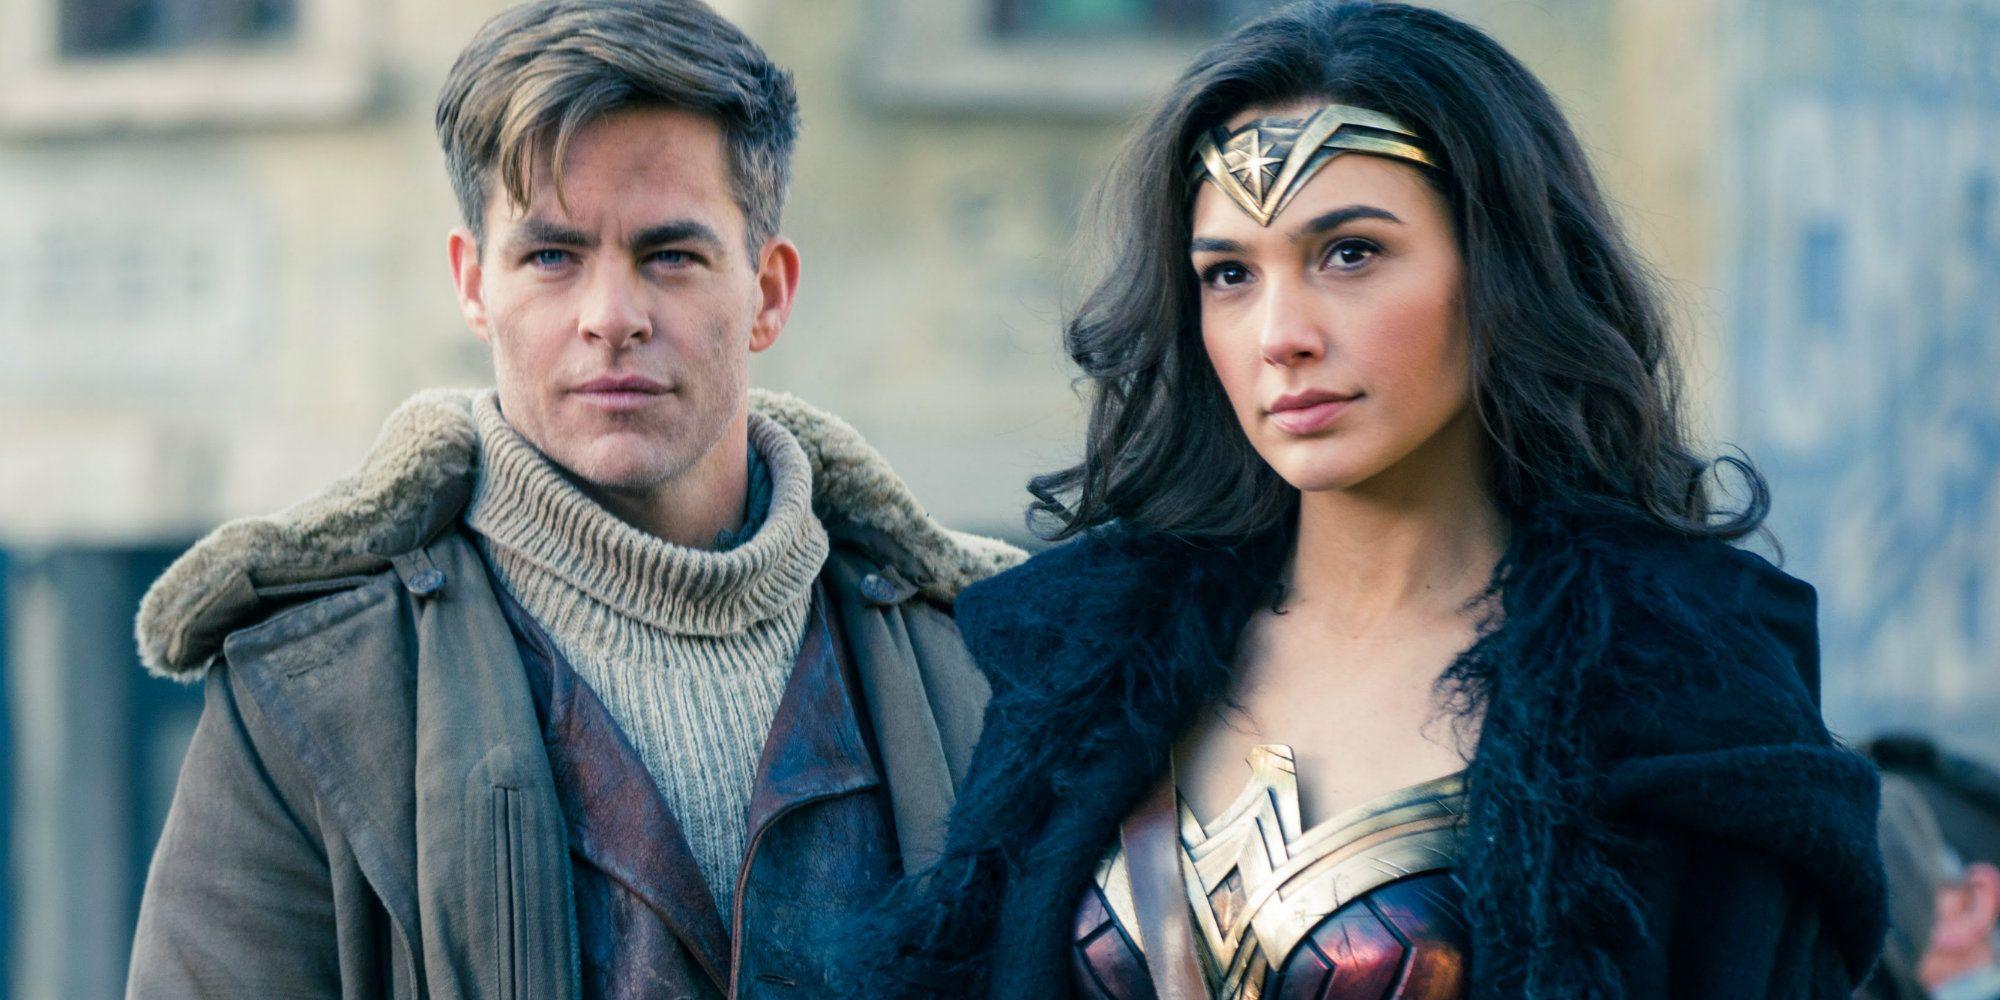 Gal Gadot Shares Wonder Woman Blooper Reel Clip